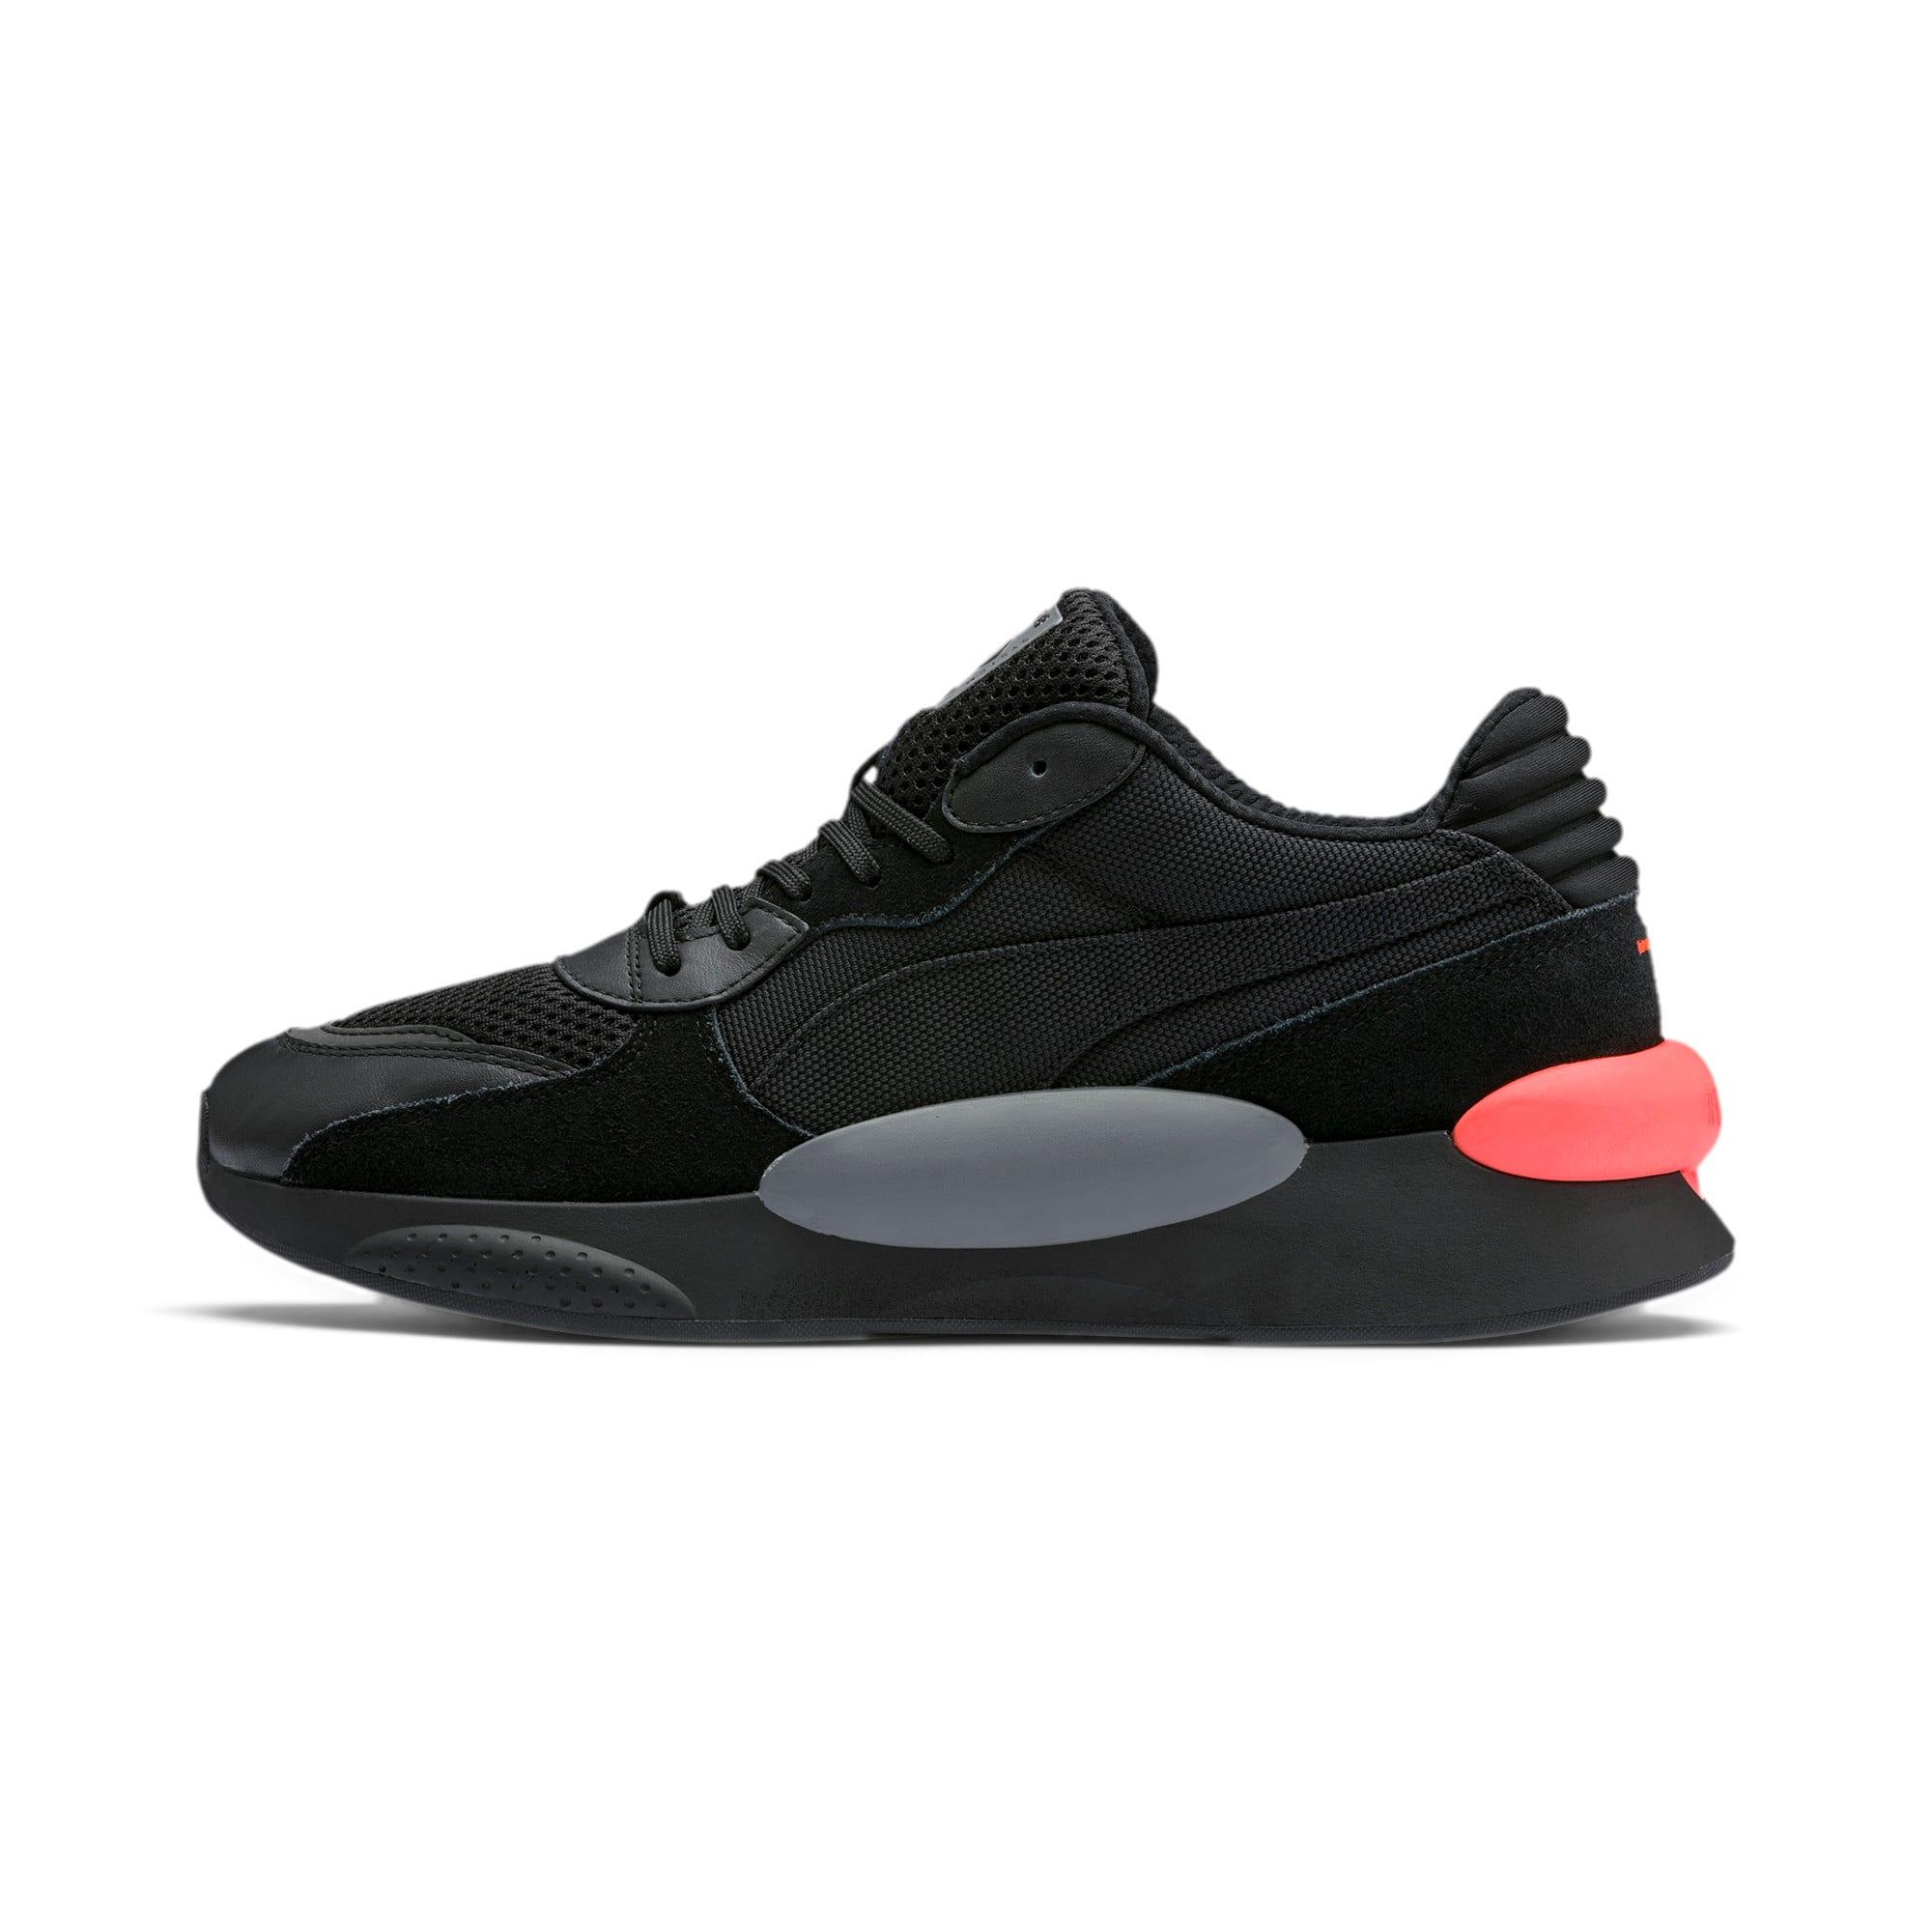 Thumbnail 1 of RS 9.8 Cosmic Sneakers, Puma Black, medium